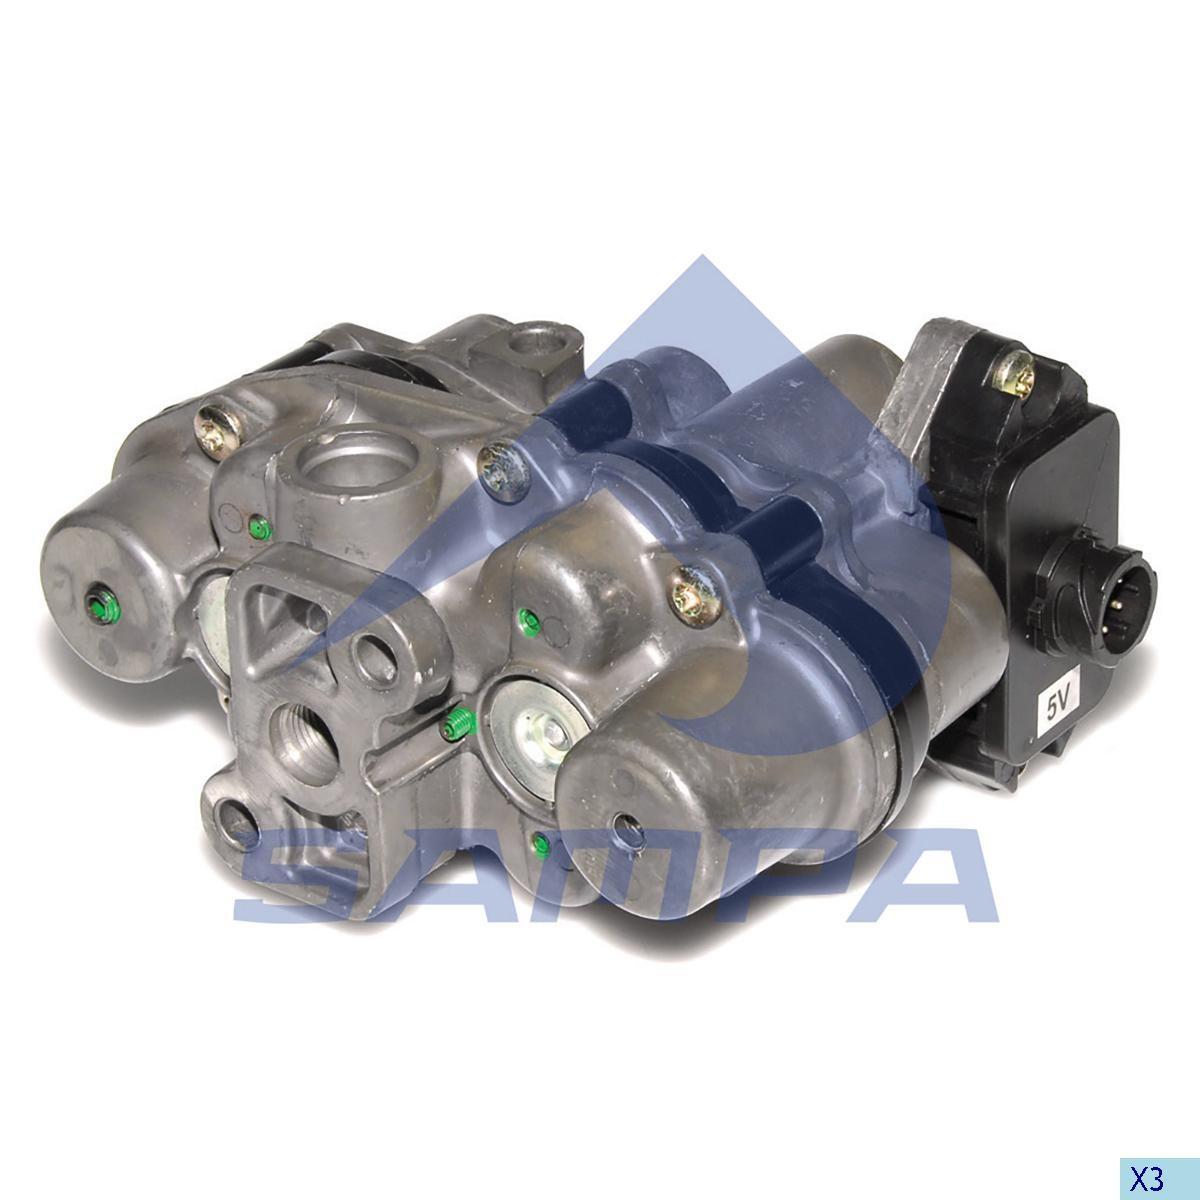 Четырех контурный кран DAF 95/105XF AE4528 (Knorr) (4 контура) photo